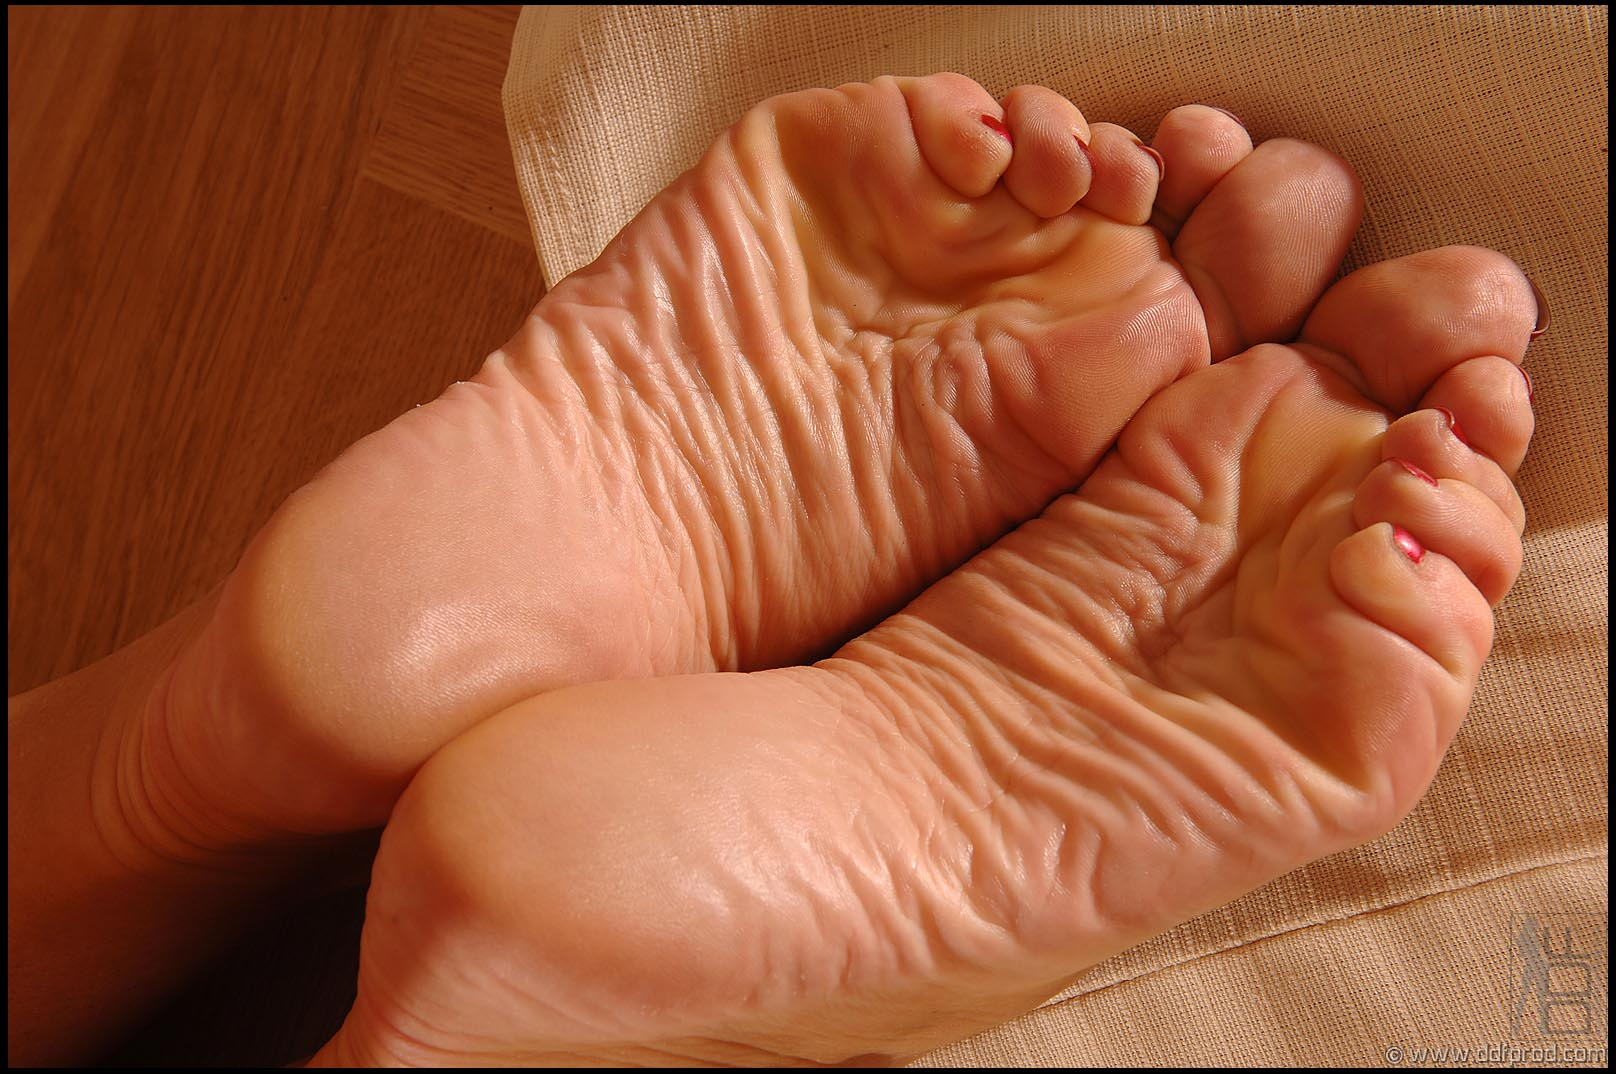 silvia saint feet naked